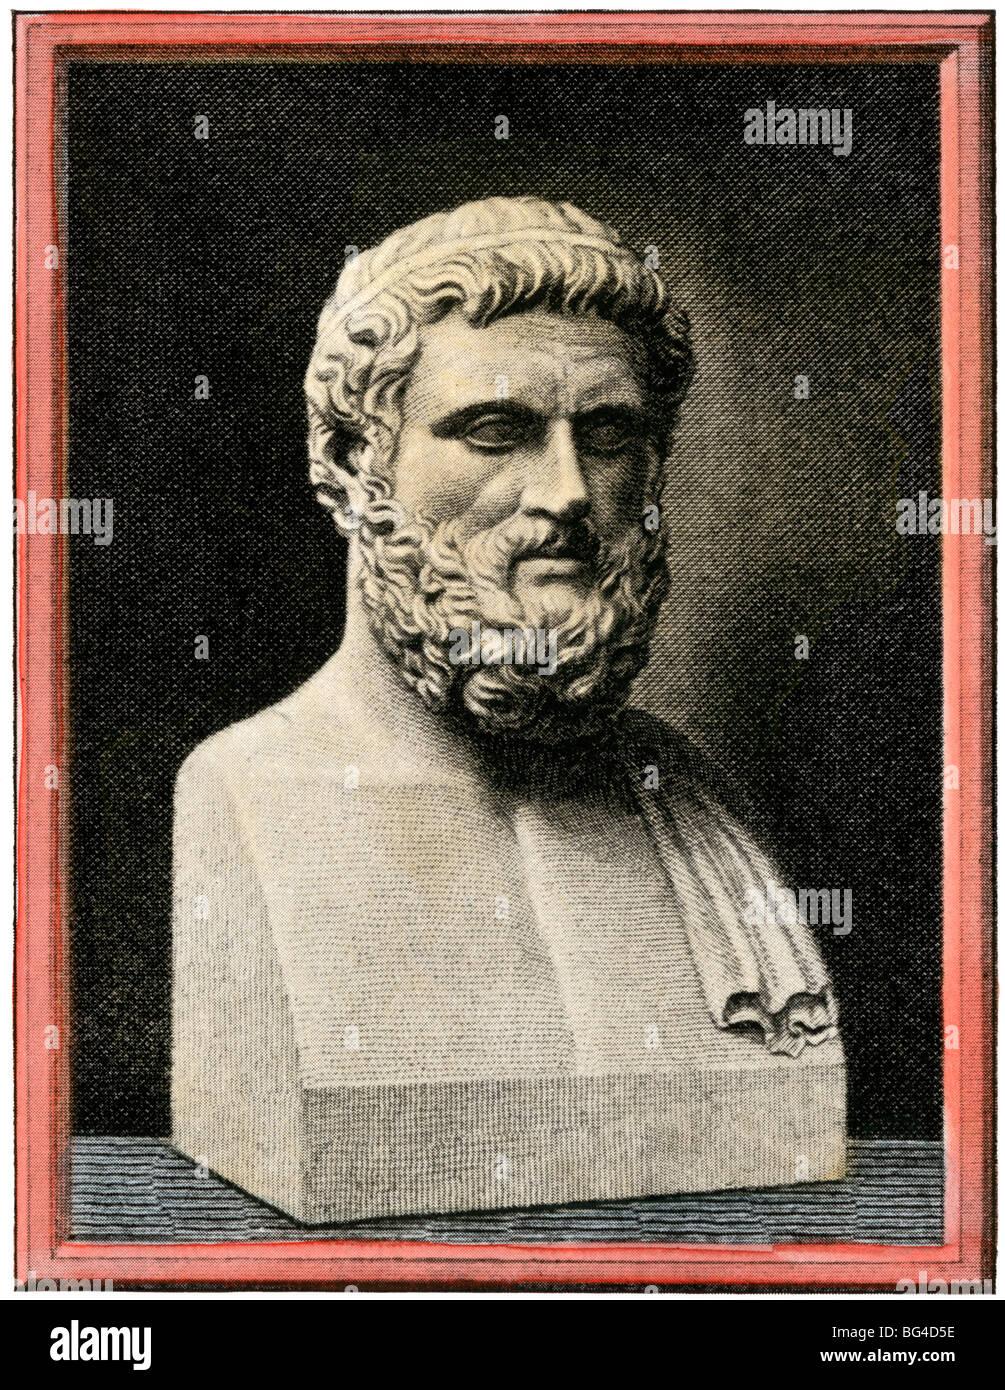 Bust of Athenian statesman Solon - Stock Image